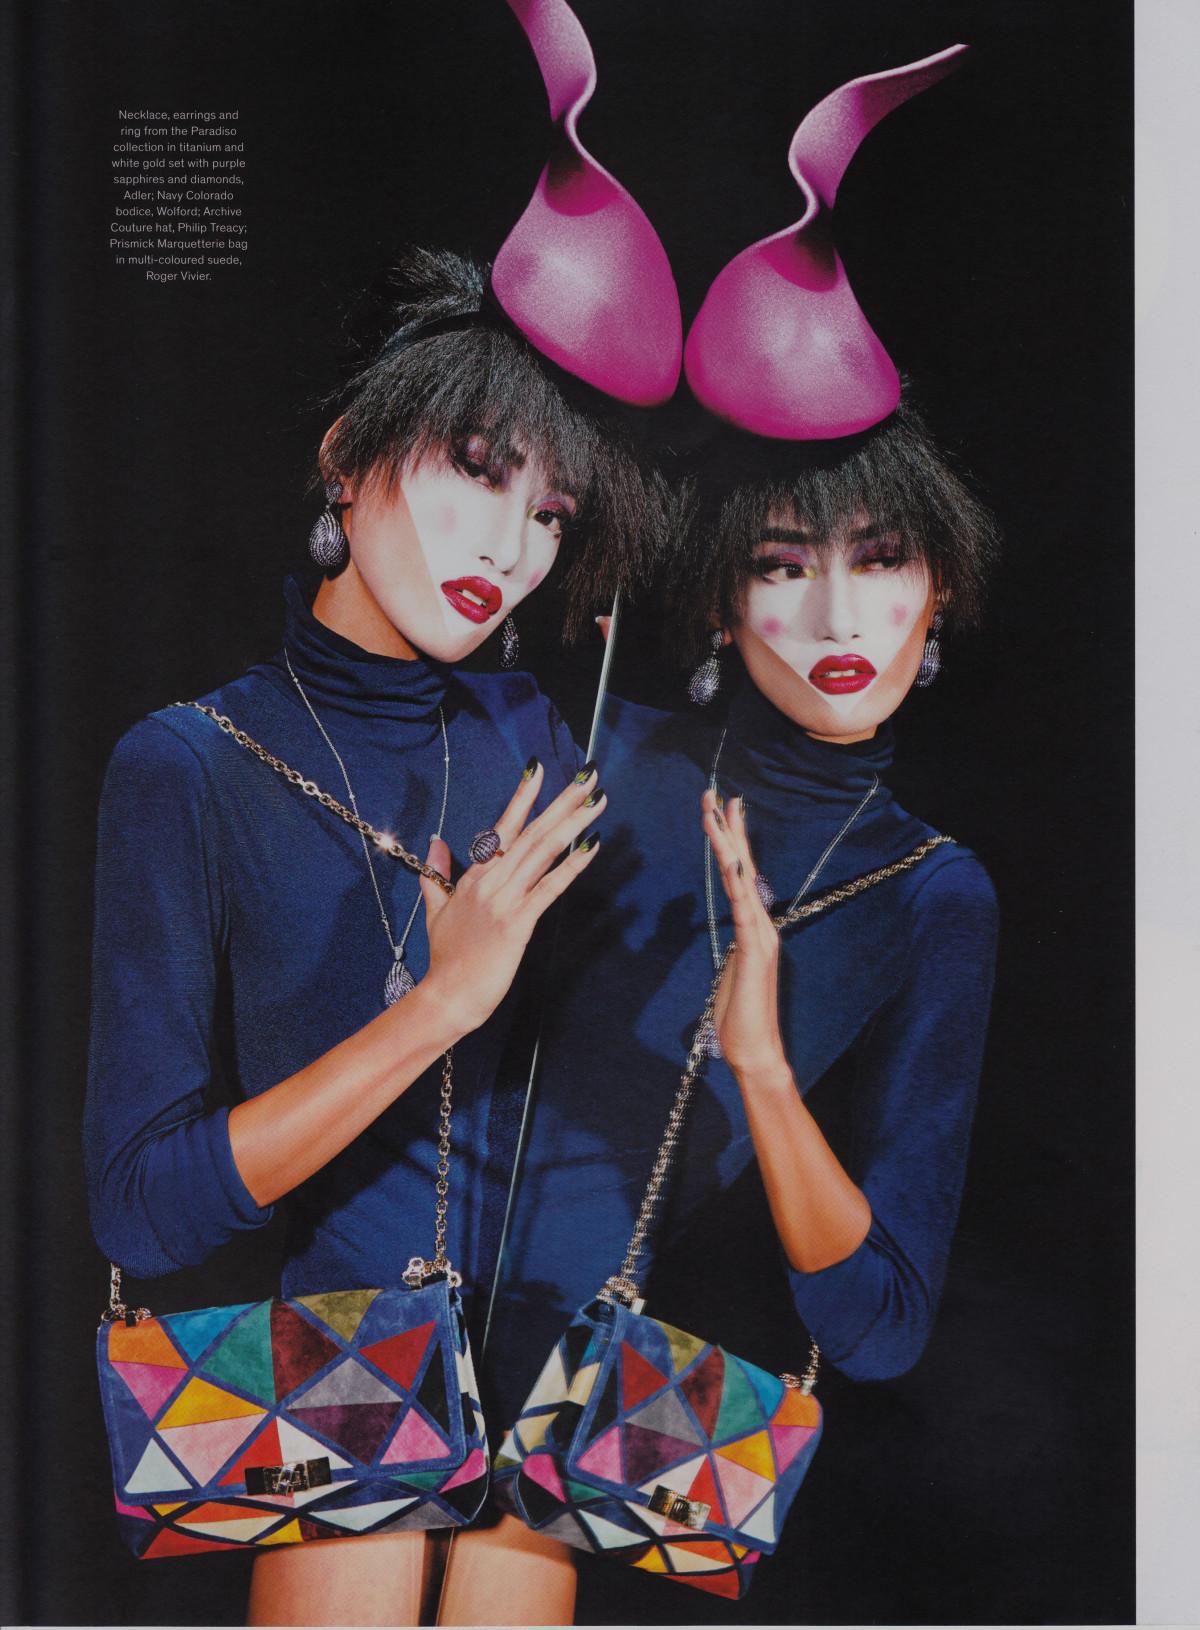 Jewelry Fashion Watches Magazine, Gigi Jeon, Polka Dots, Dots Makeup, Philip Treacy, Mac Pro Cosmetics